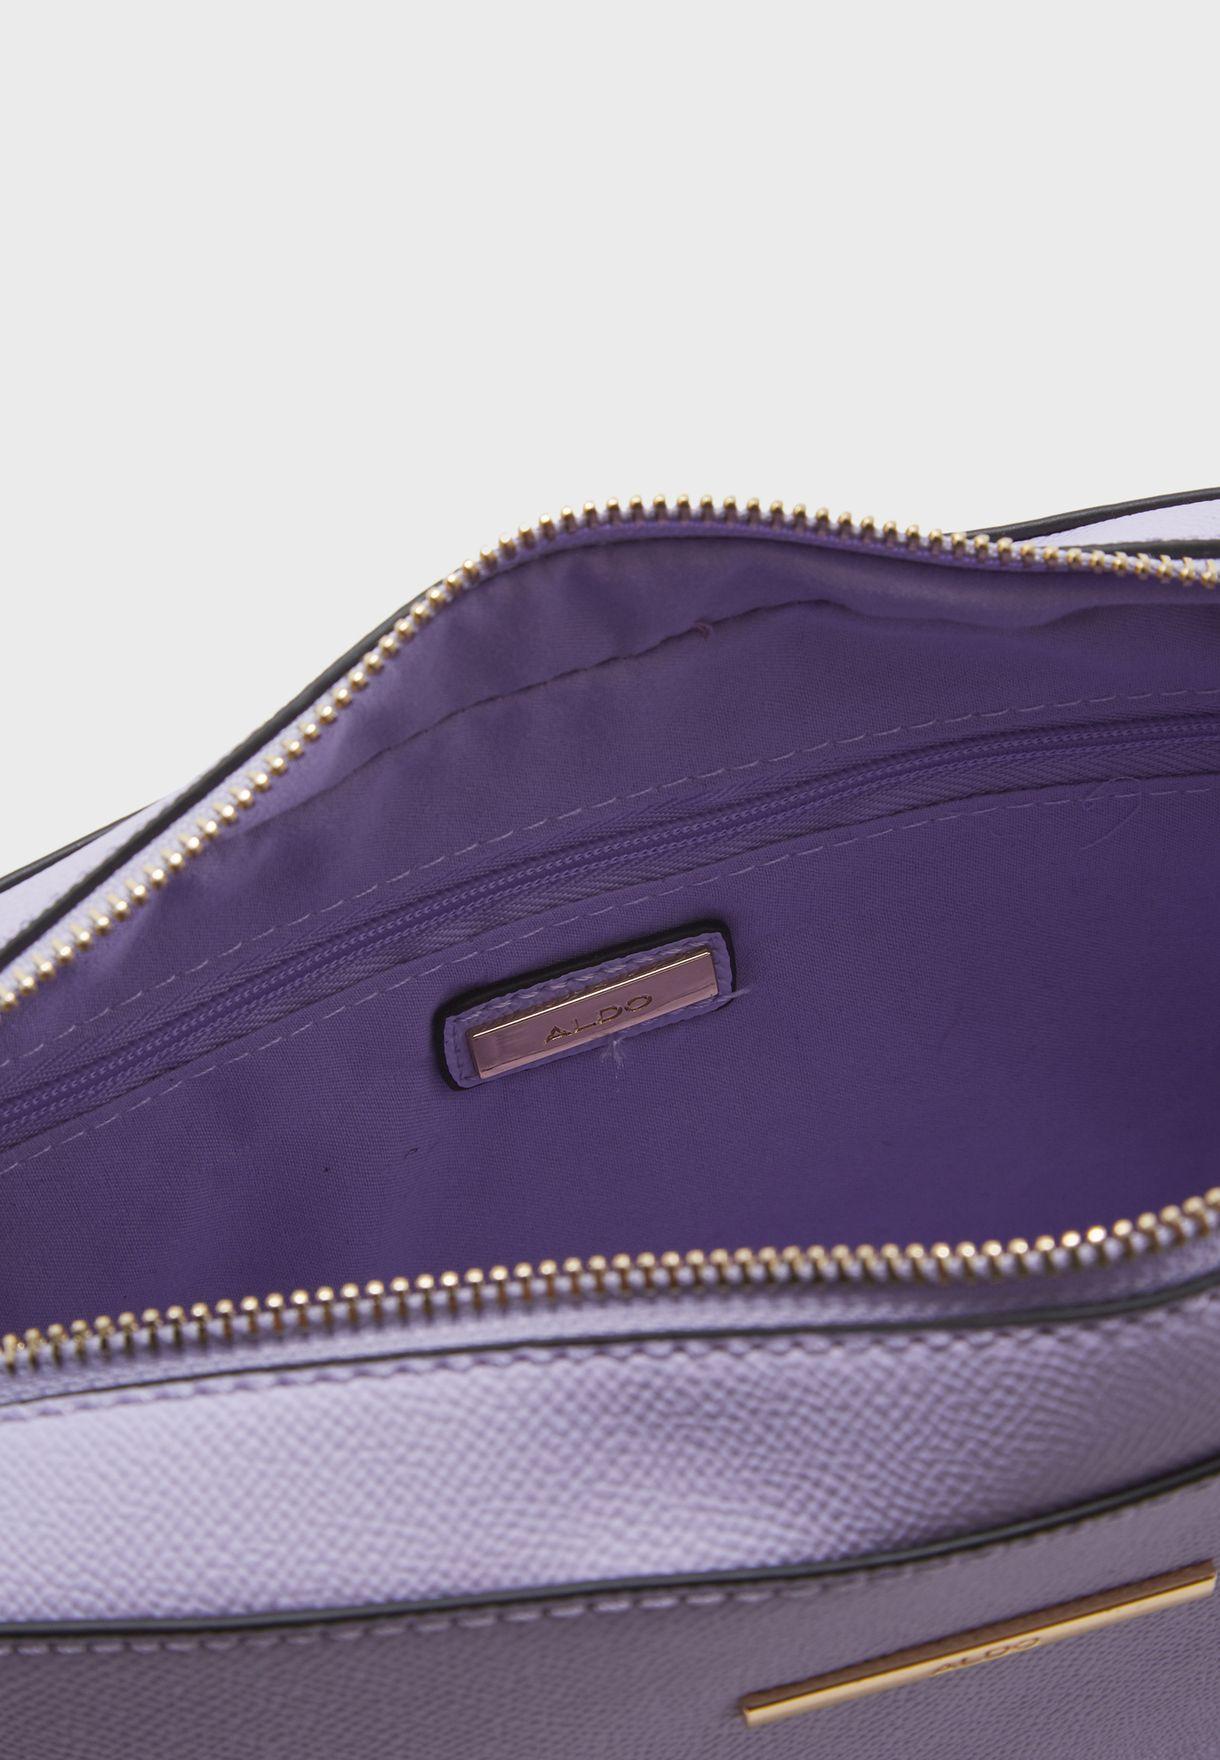 1a0f7c0ded1 Shop Aldo purple Reform Crossbody ELROOI52 for Women in UAE ...